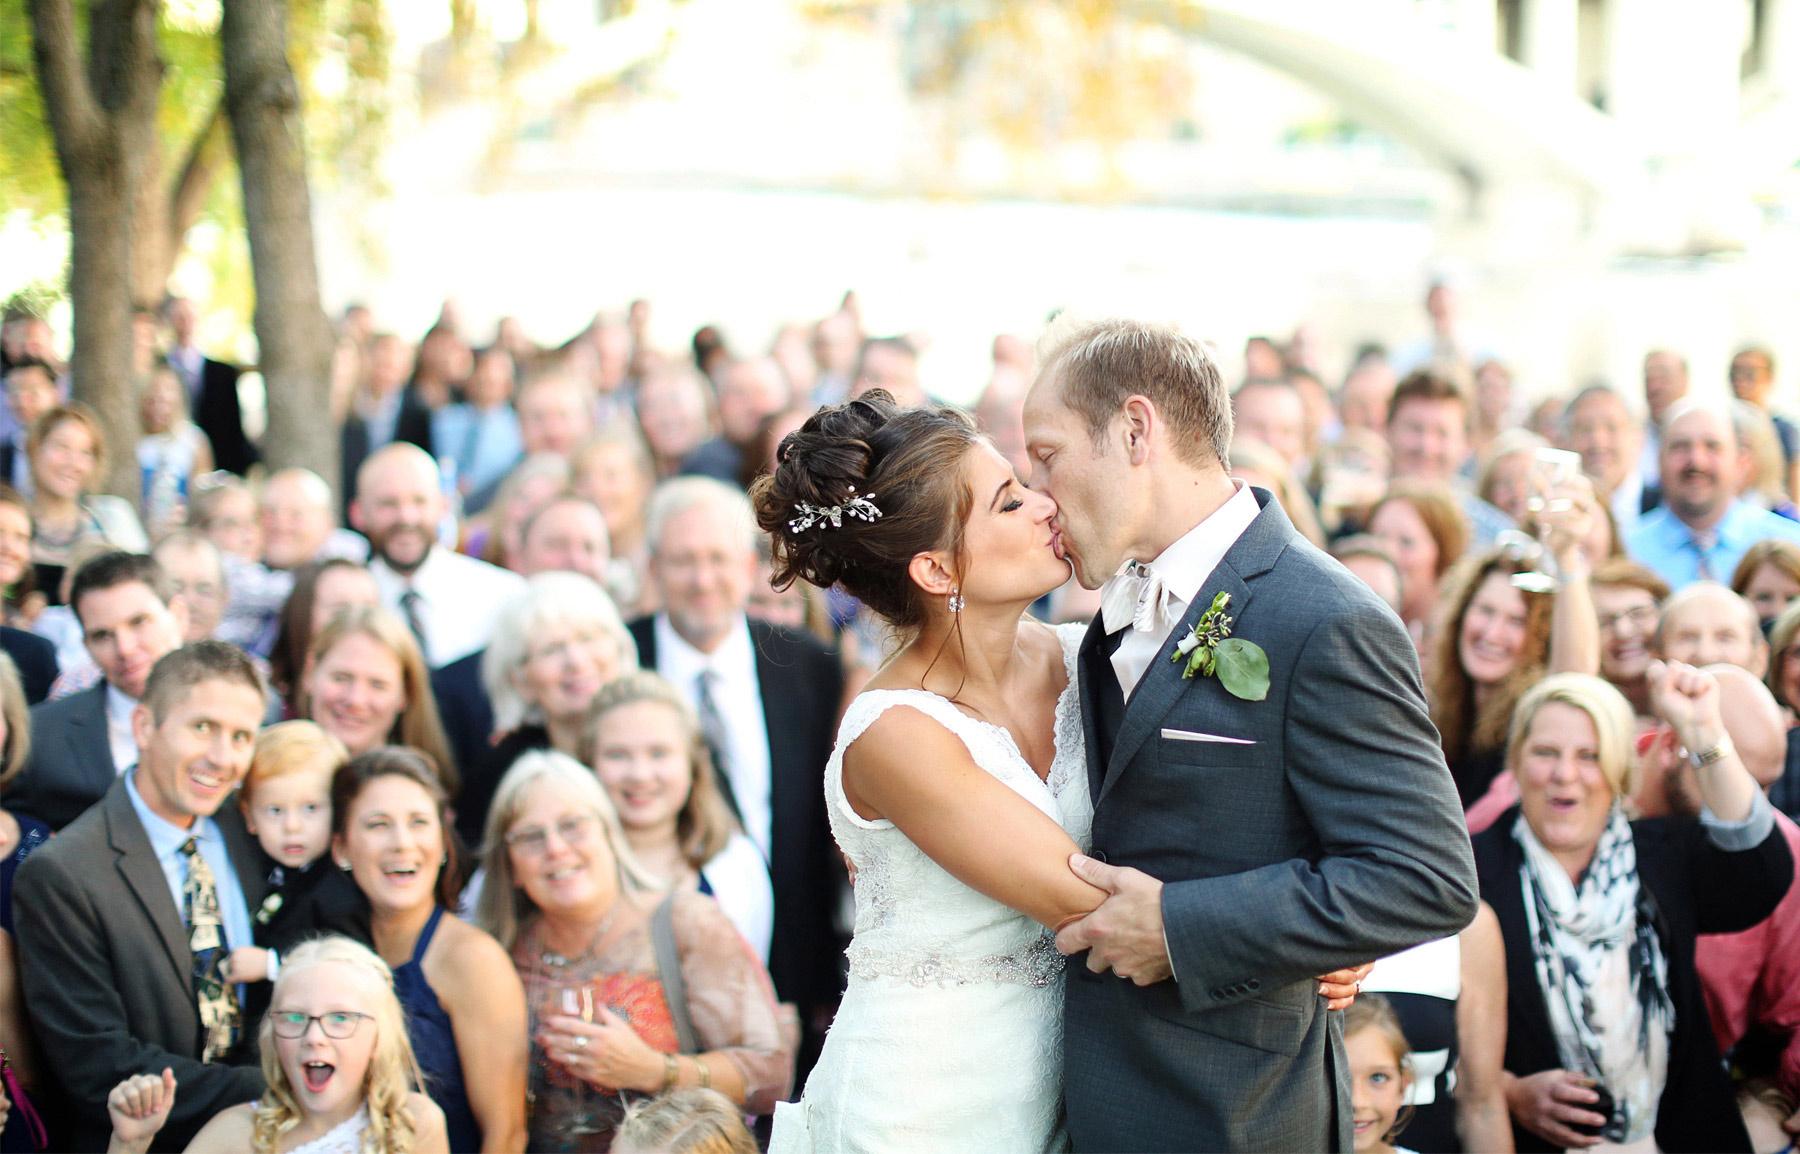 22-Minneapolis-Minnesota-Wedding-Photographer-by-Andrew-Vick-Photography-Fall-Autumn-Bride-Groom-Guests-Kiss-Paula-and-Jason.jpg